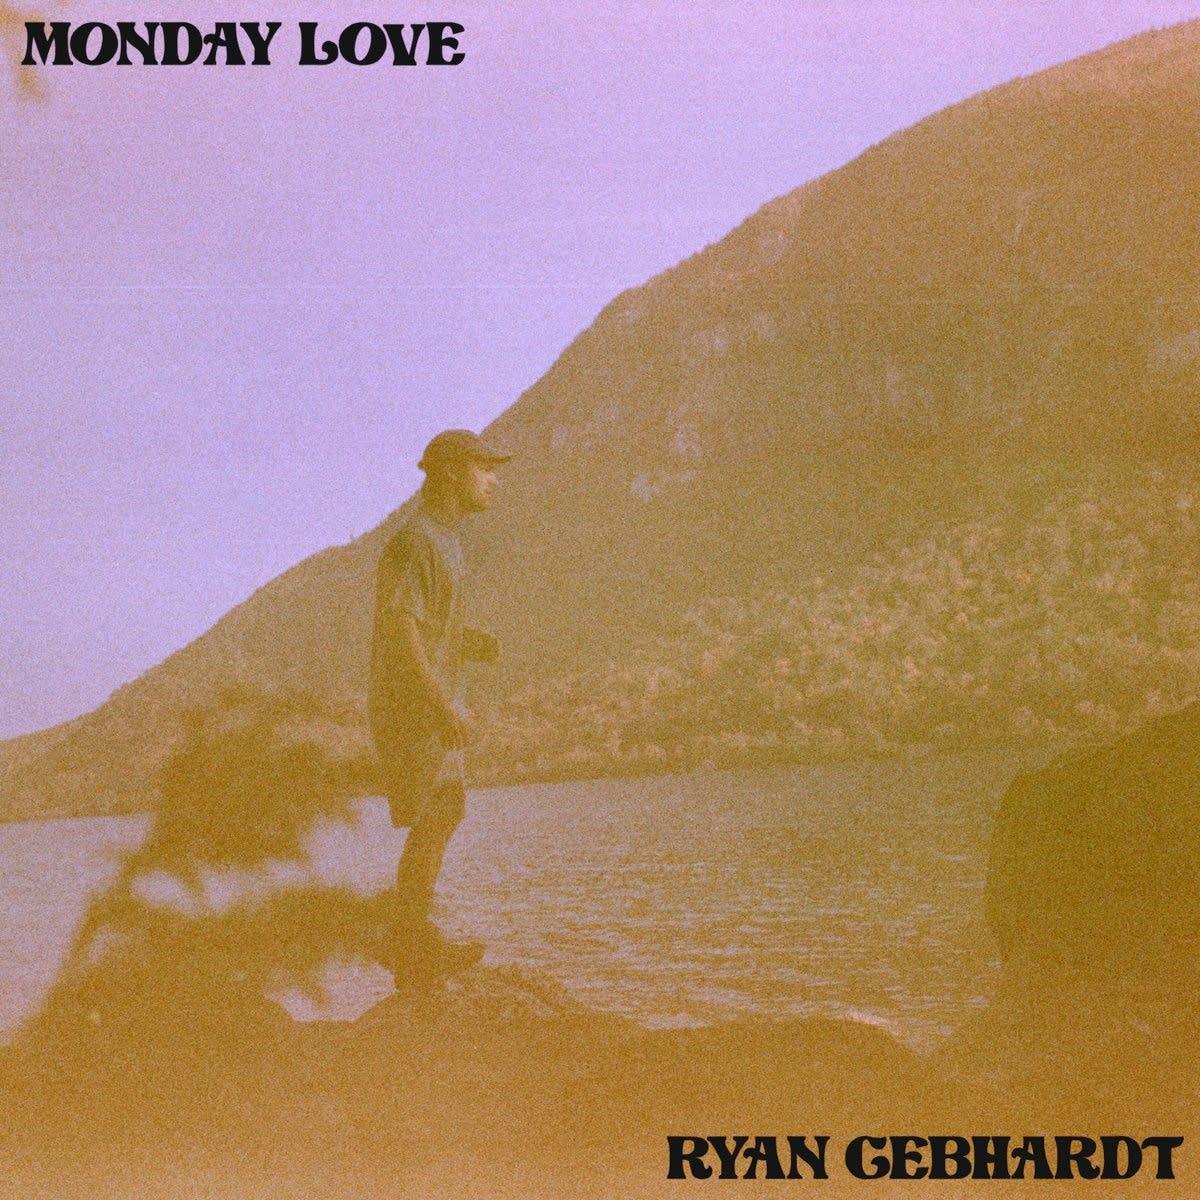 Ryan Gebhardt